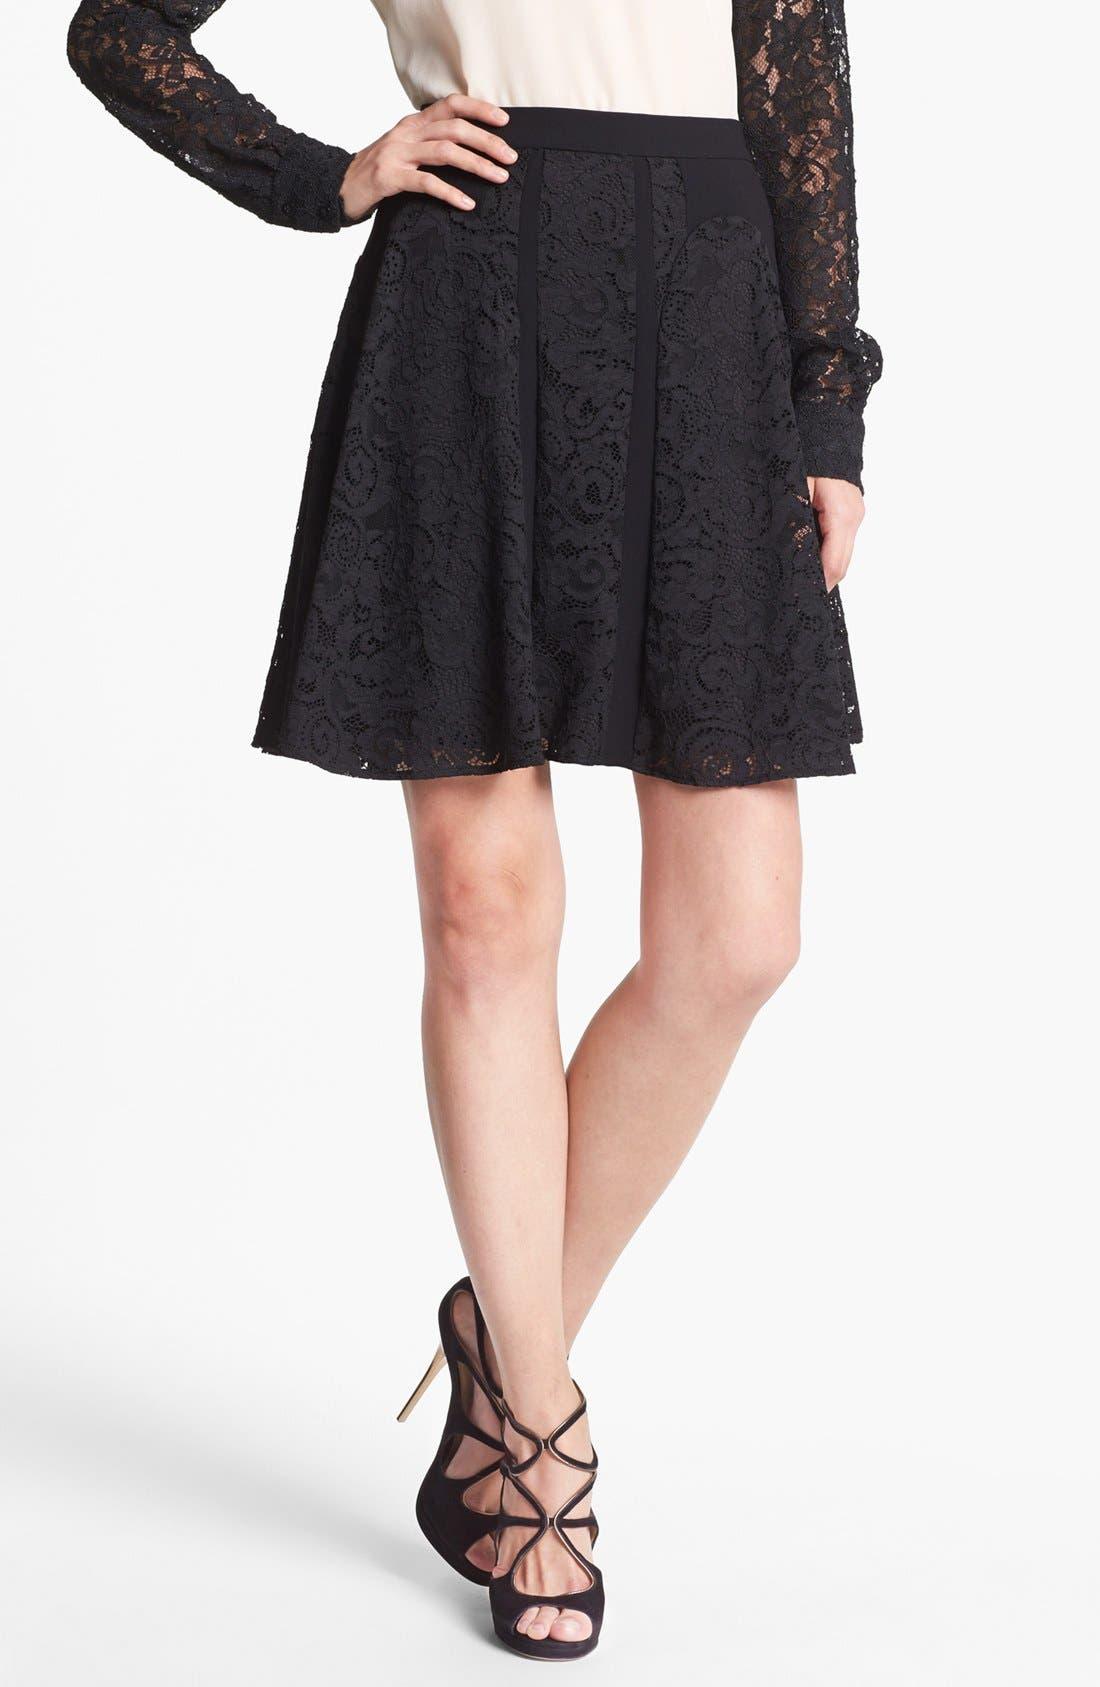 Alternate Image 1 Selected - Diane von Furstenberg 'Radella' Paneled Lace Skirt